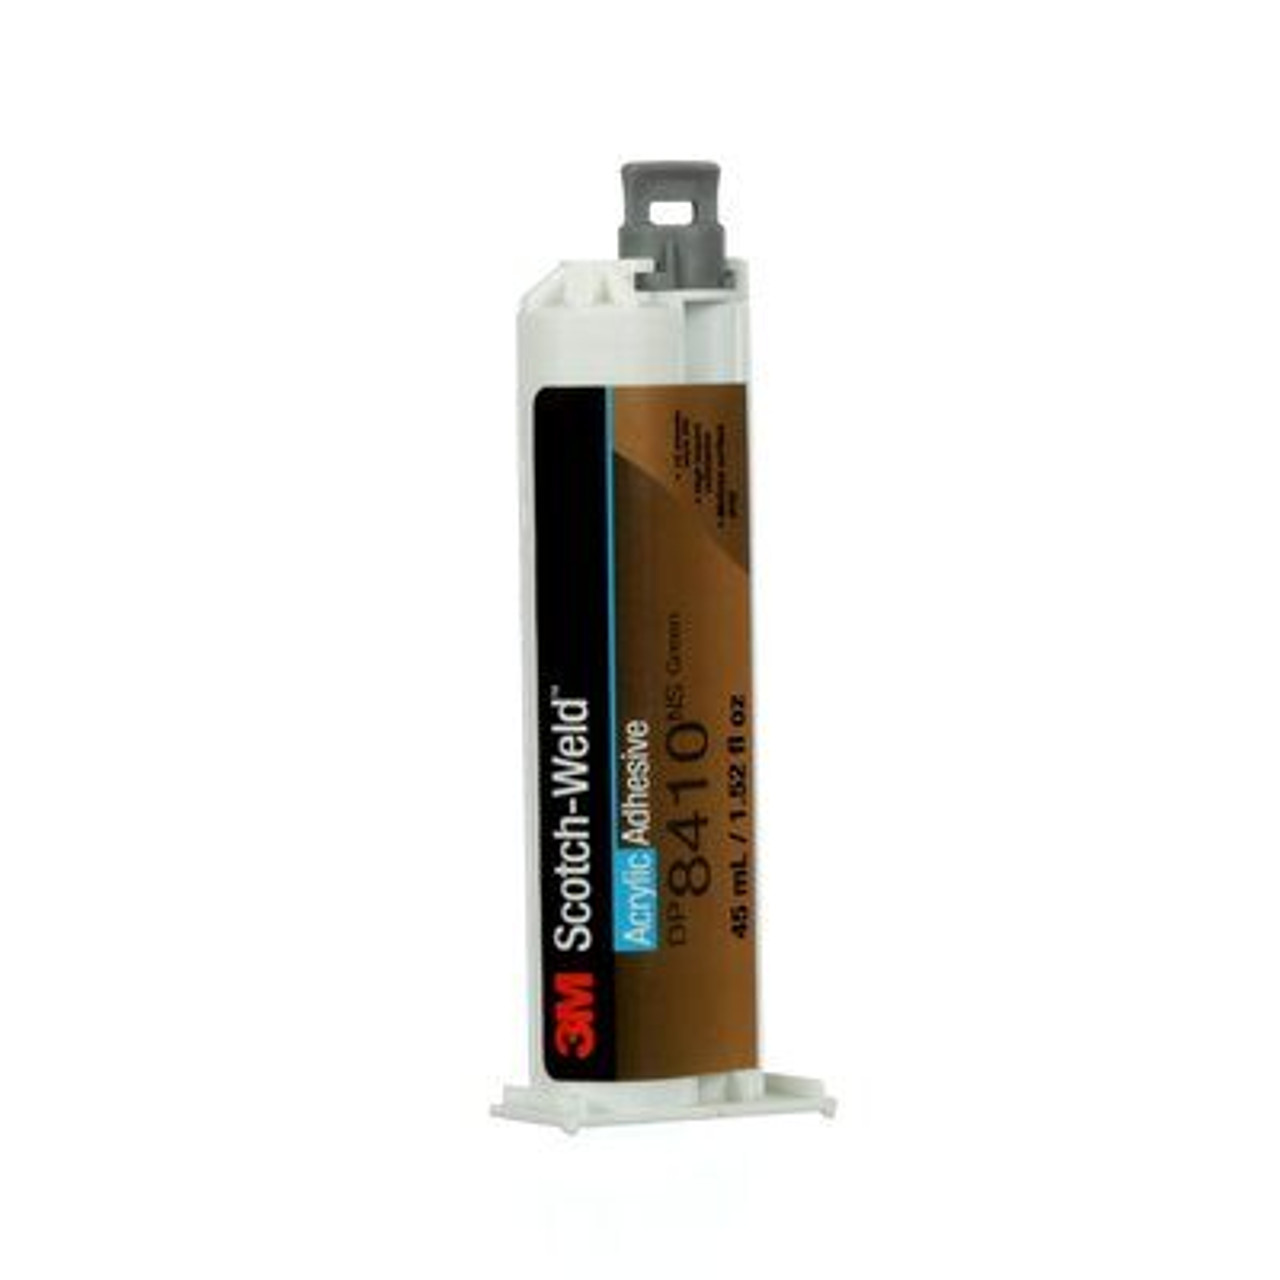 3M™ Scotch-Weld™ Acrylic Adhesive DP8410NS, Green, 45 mL Duo-Pak